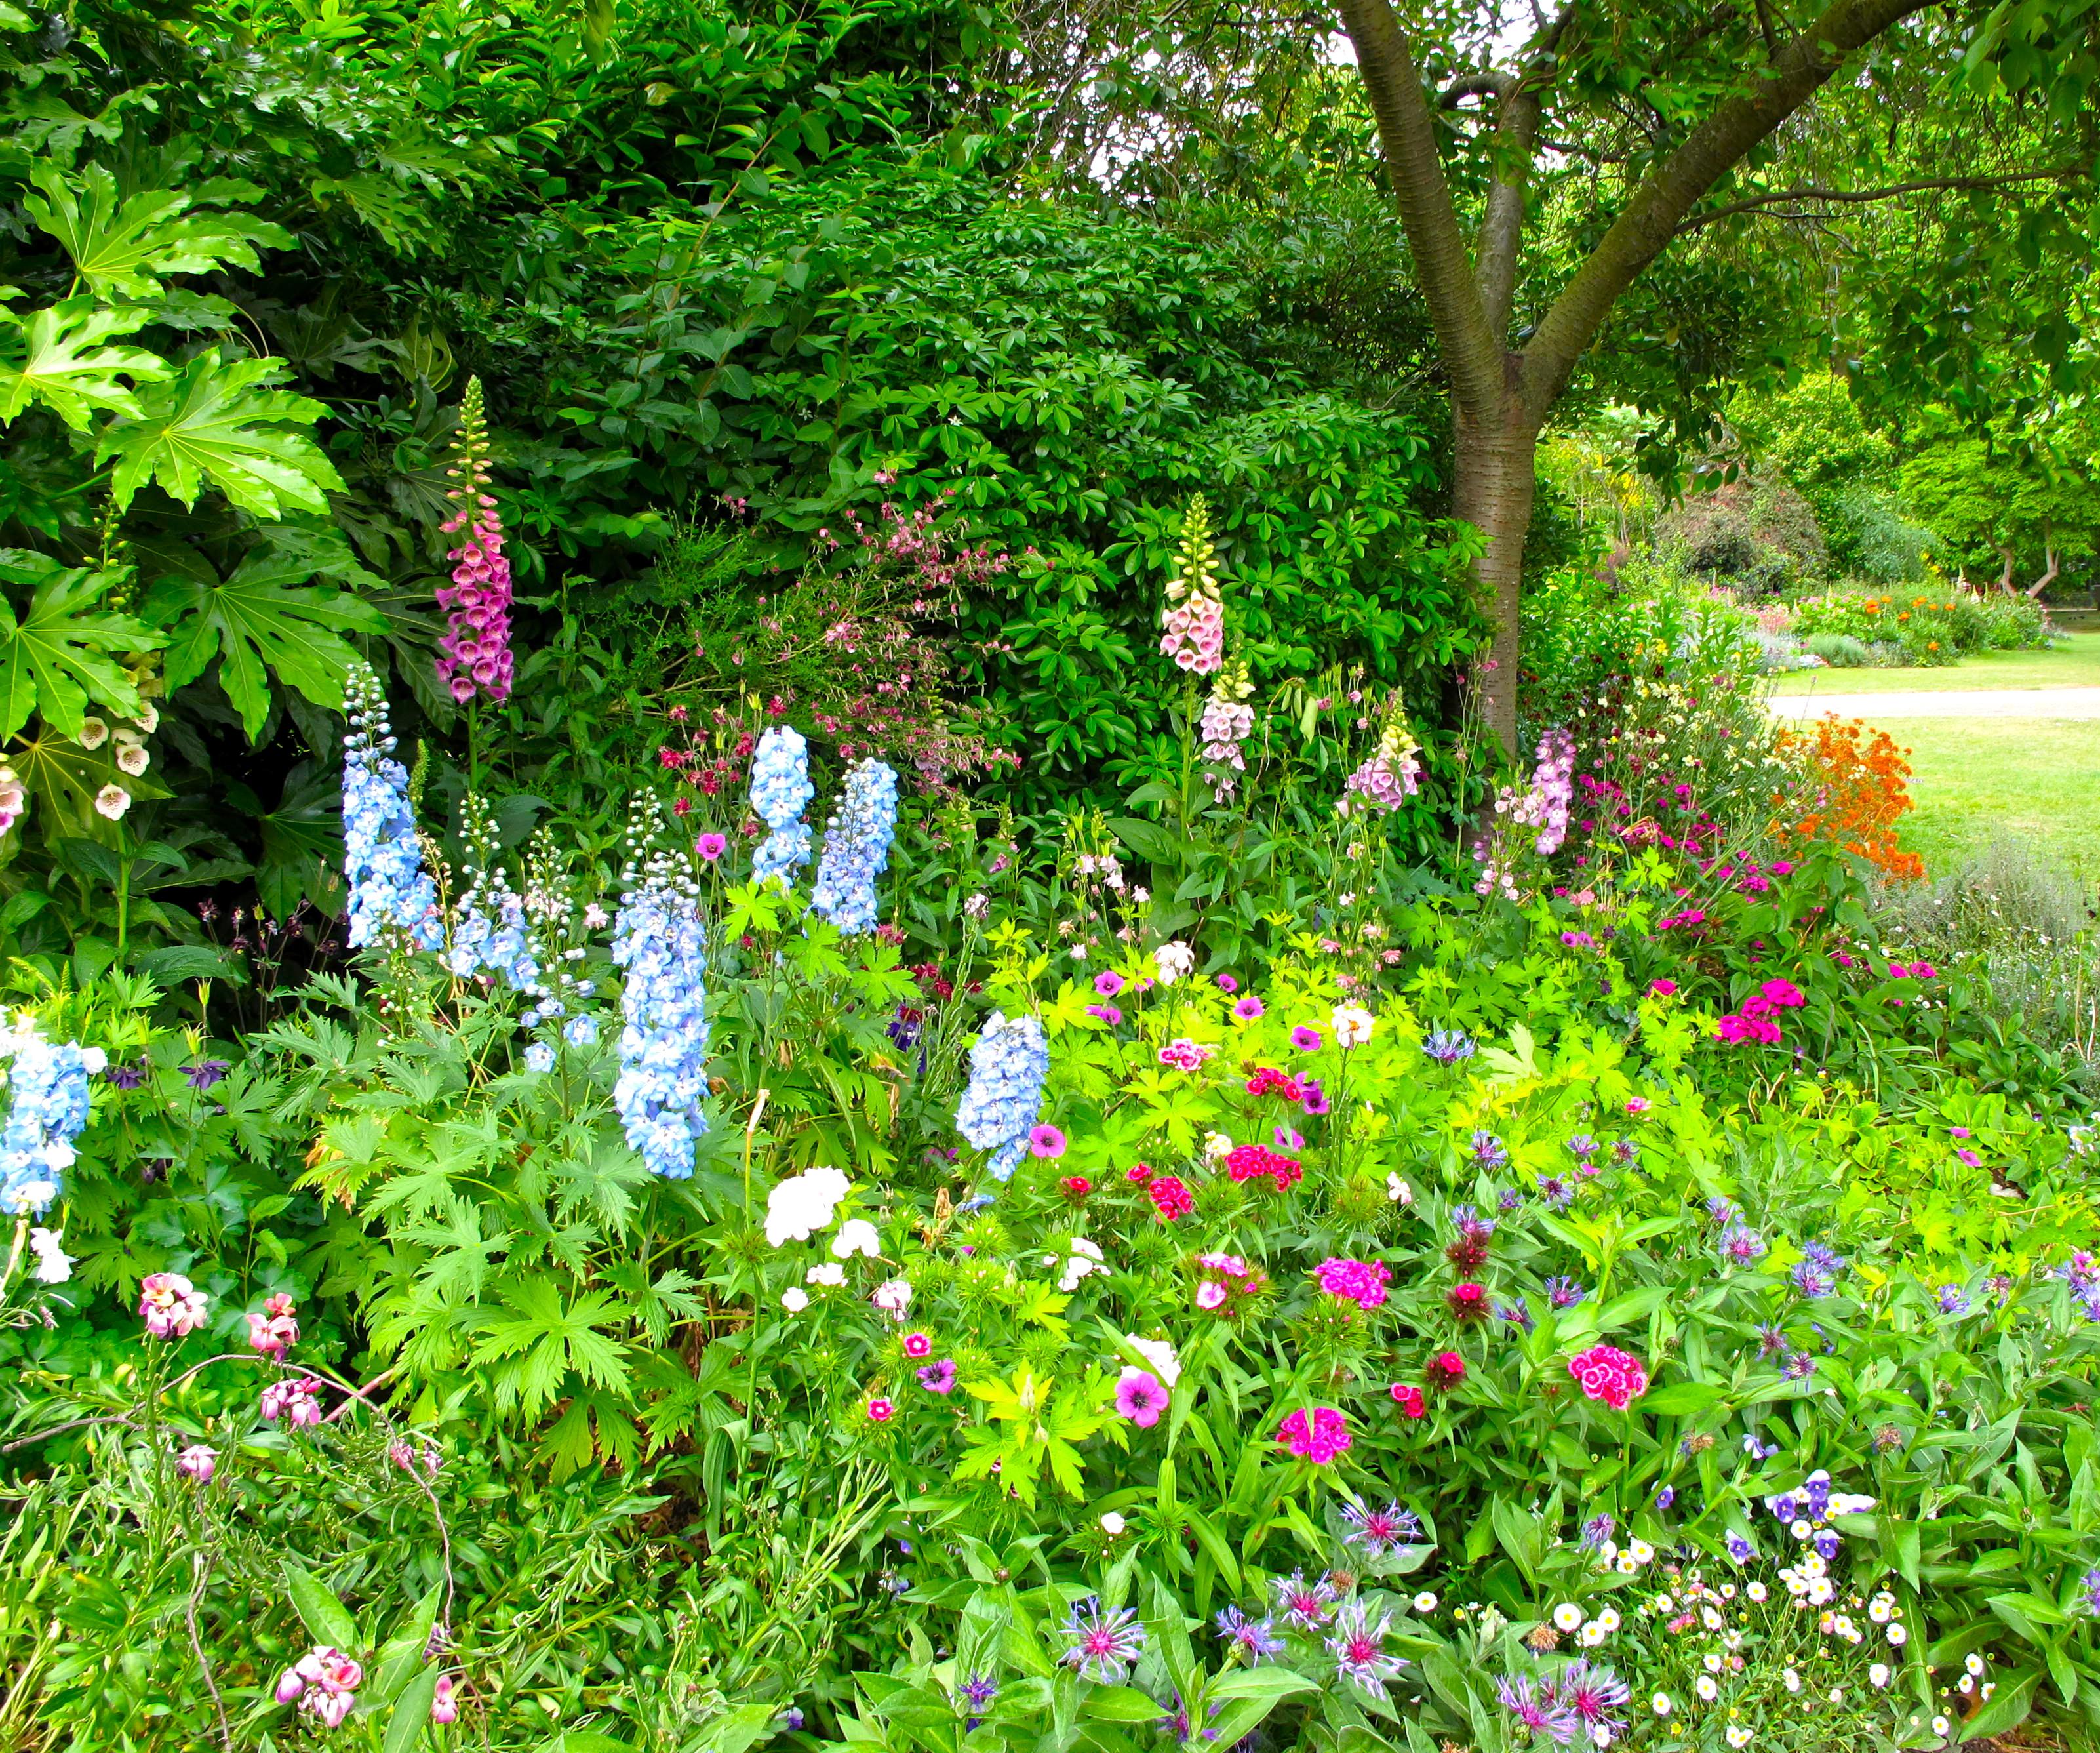 Garden flowers words of wisdom galatians 5 22 roses summer